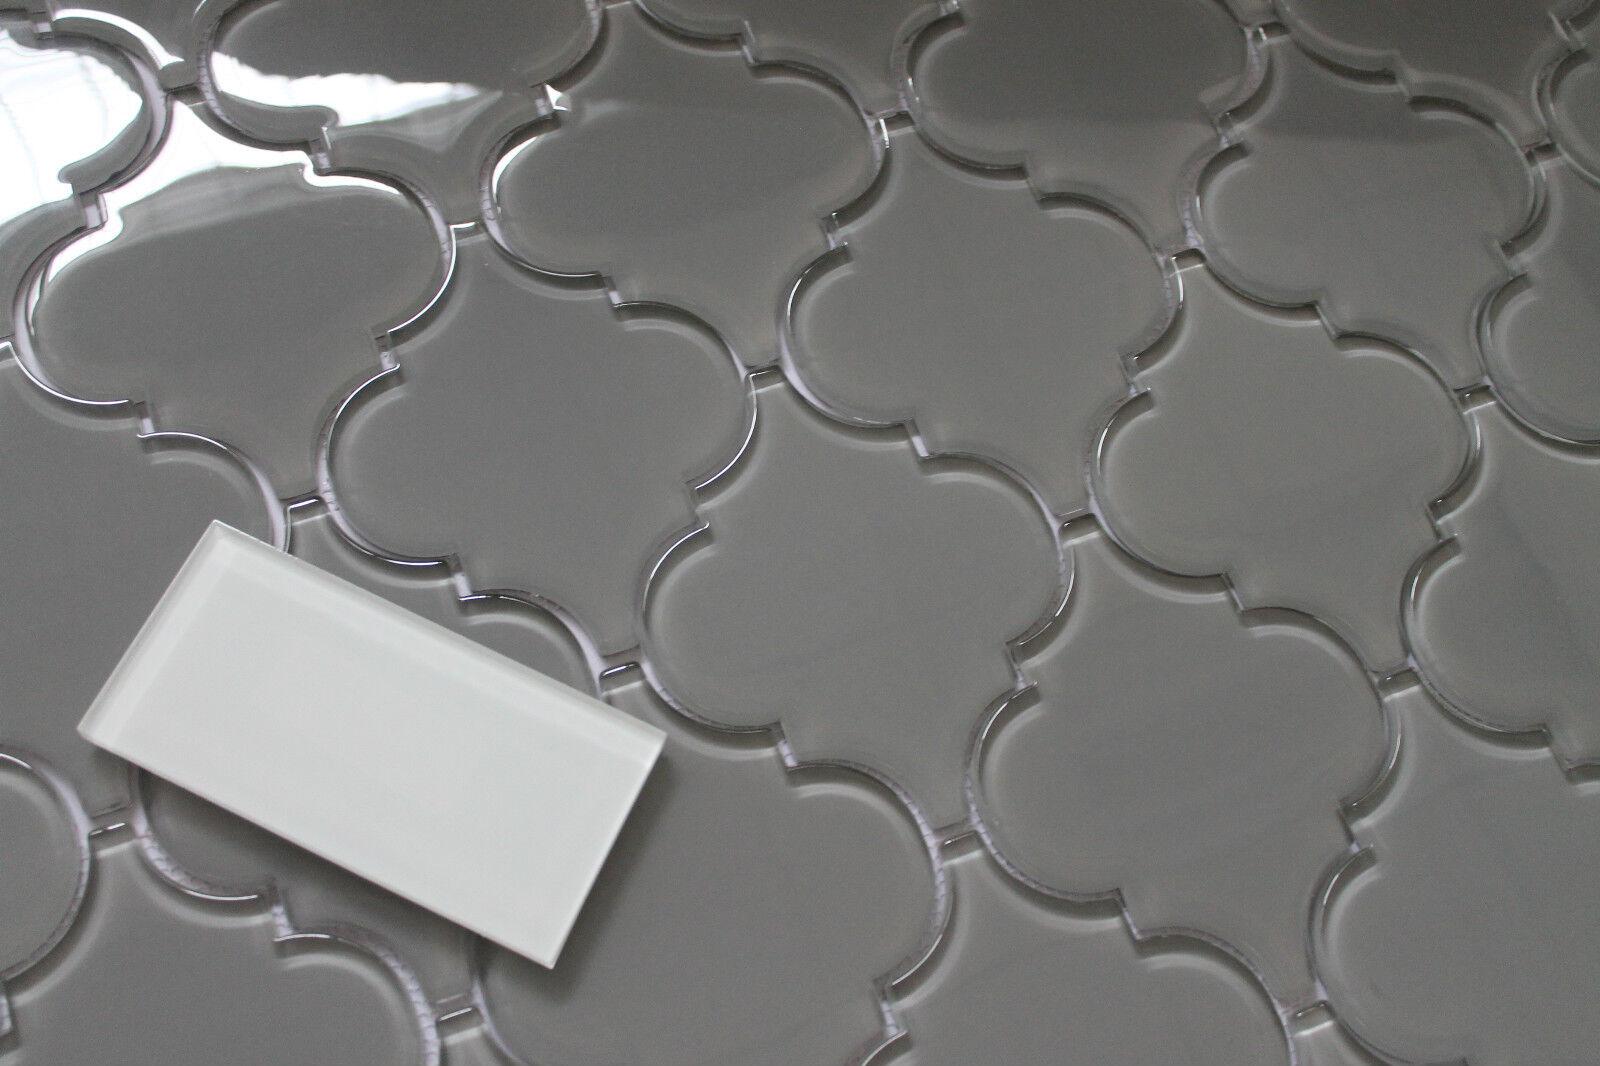 Black Grey White Glass Mosaic Wall Tiles Random Mix For Bathroom Kitchen 012 For Sale Online Ebay